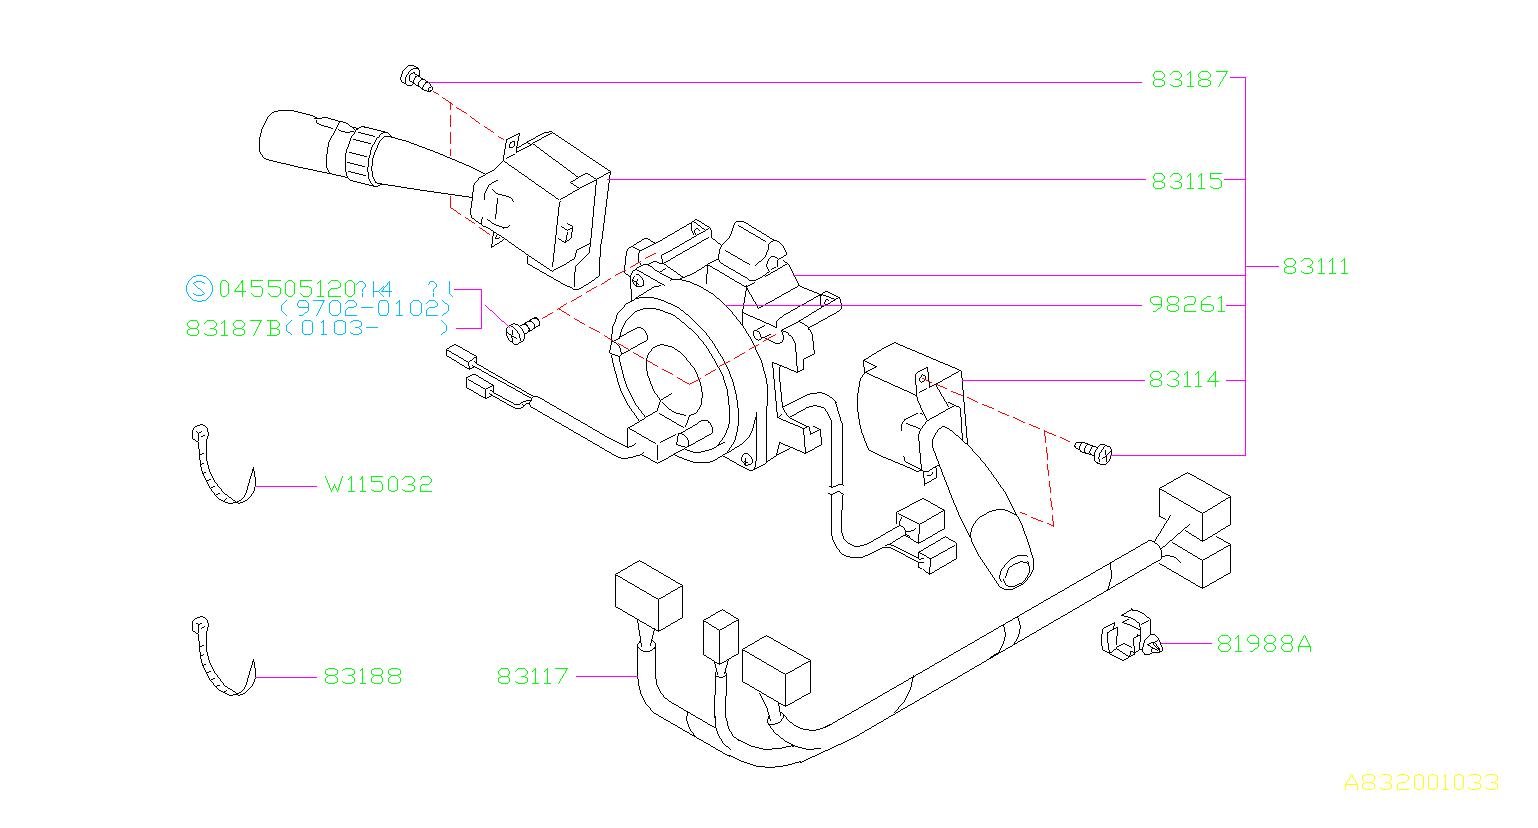 Subaru Forester Steering Column Wiring Harness ...